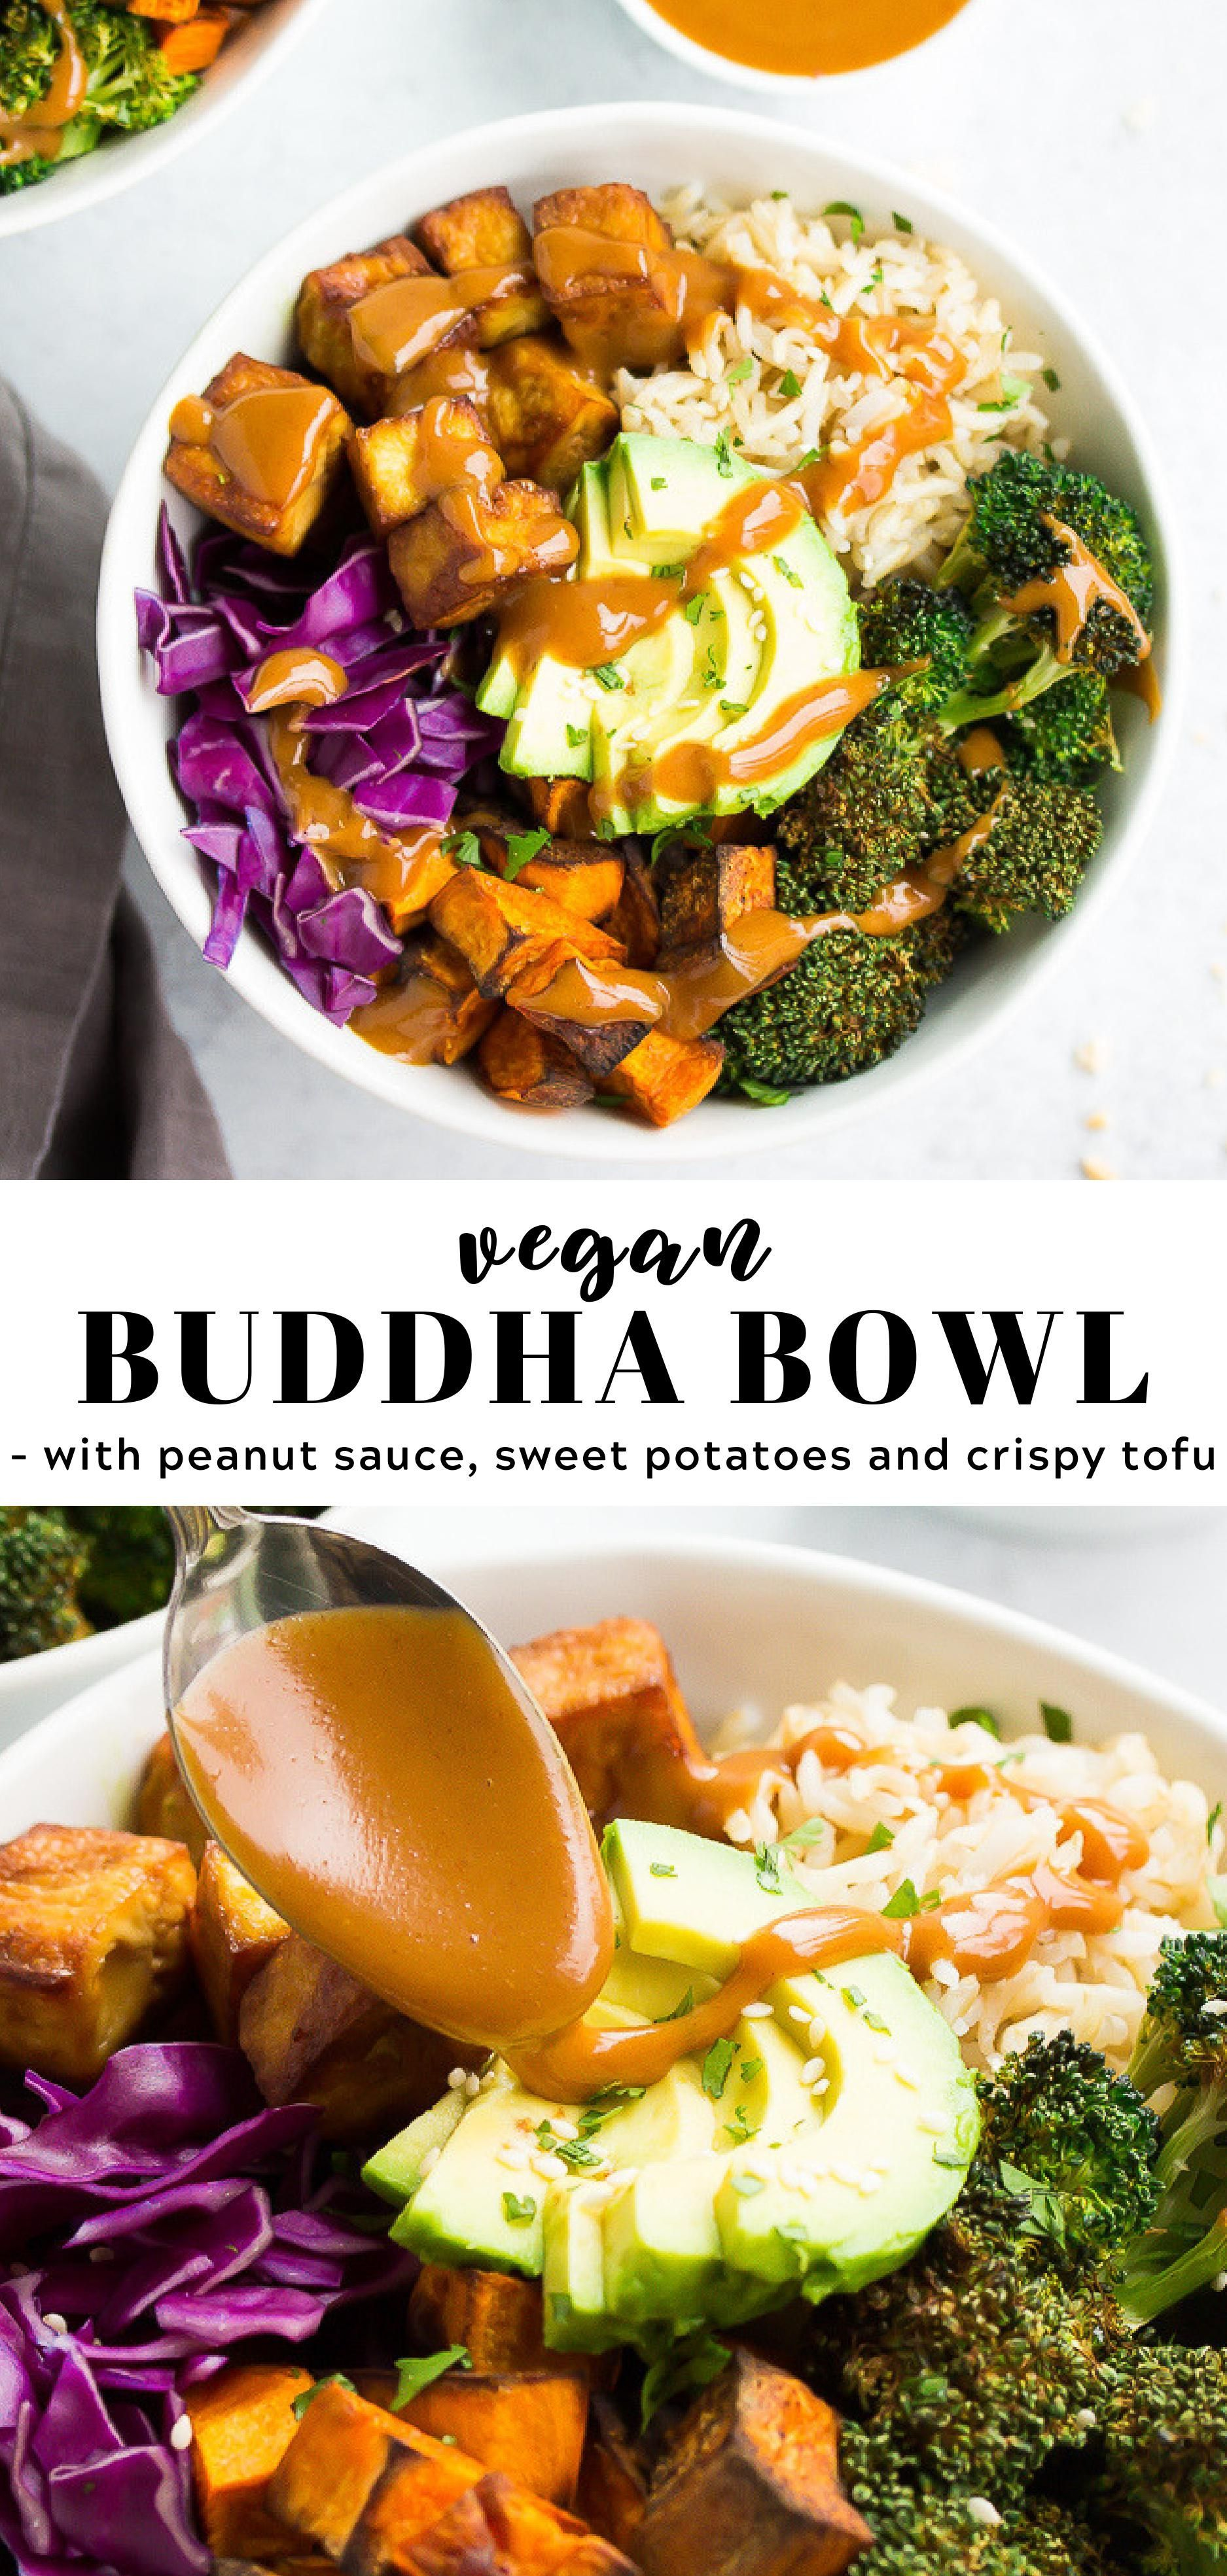 Vegan Buddha Bowl with roasted broccoli, crispy tofu, sweet potatoes and the best peanut sauce!